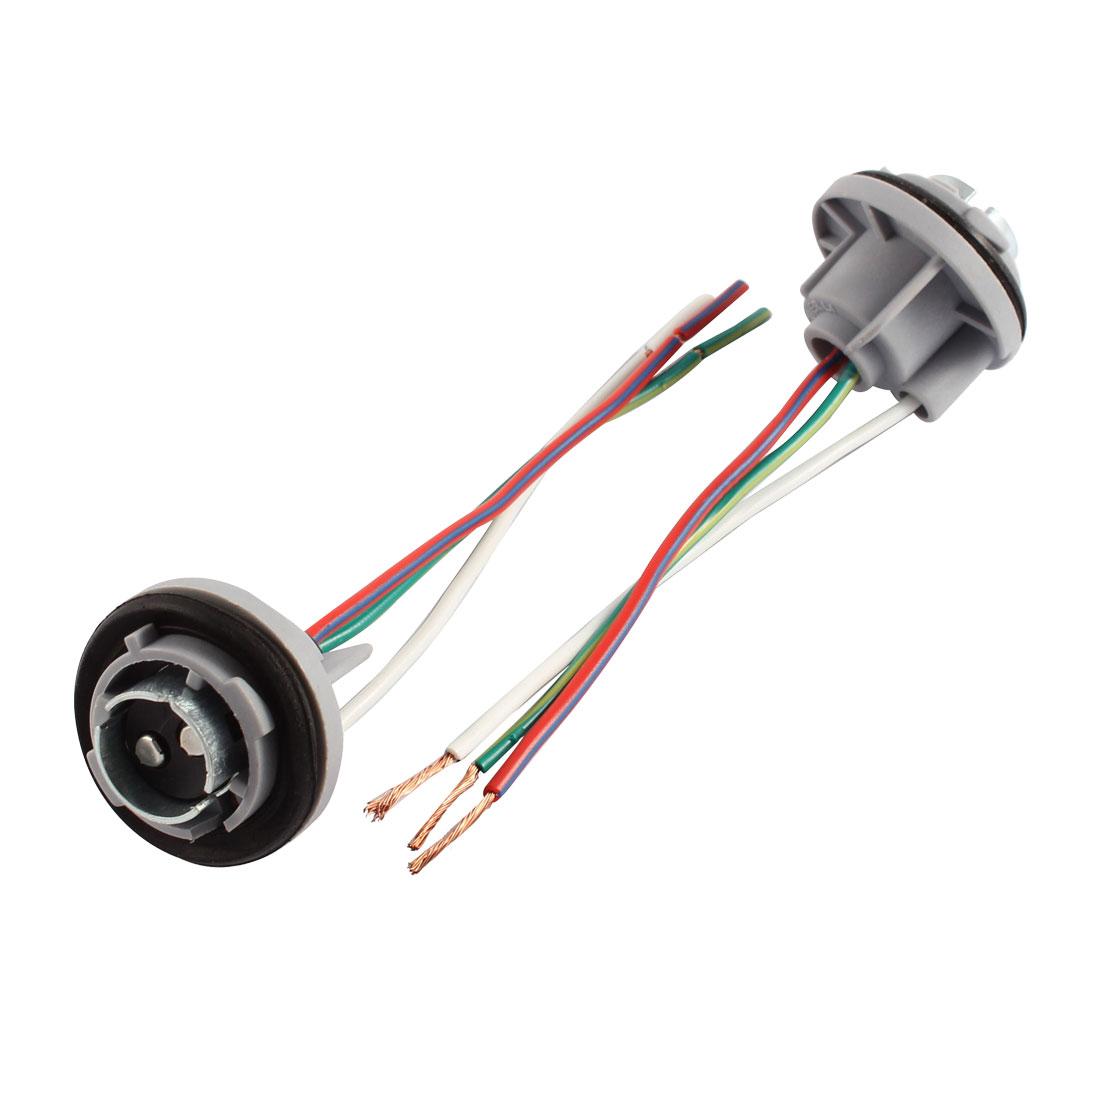 BAY15D 1157 LED Car Signal Stop Brake Bulb Lamp Light Socket Holder 2 Pcs